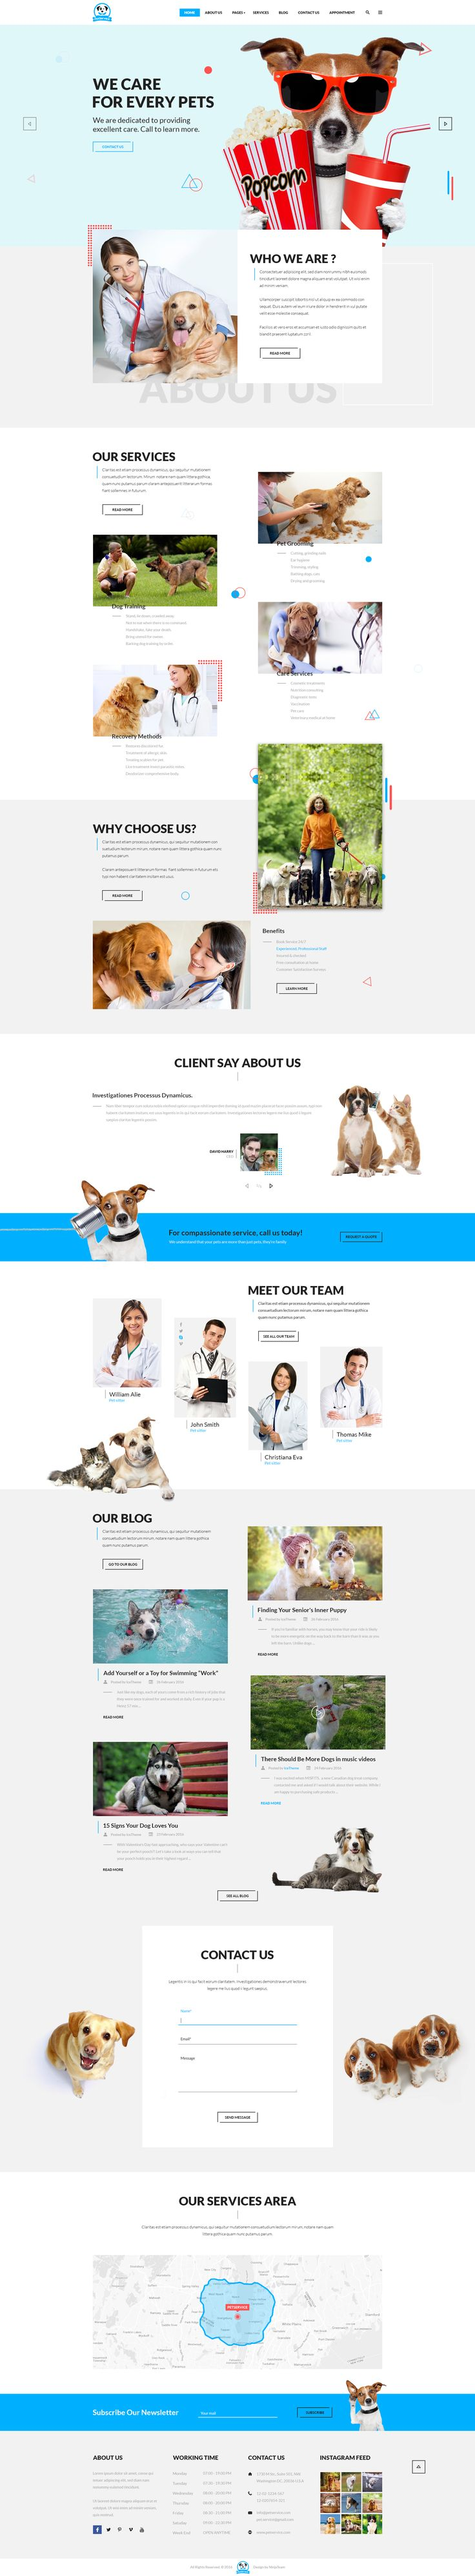 Pet Service - A Pet Services PSD Template • Download ➝ https://themeforest.net/item/pet-service-a-pet-services-psd-template/15430137?ref=pxcr